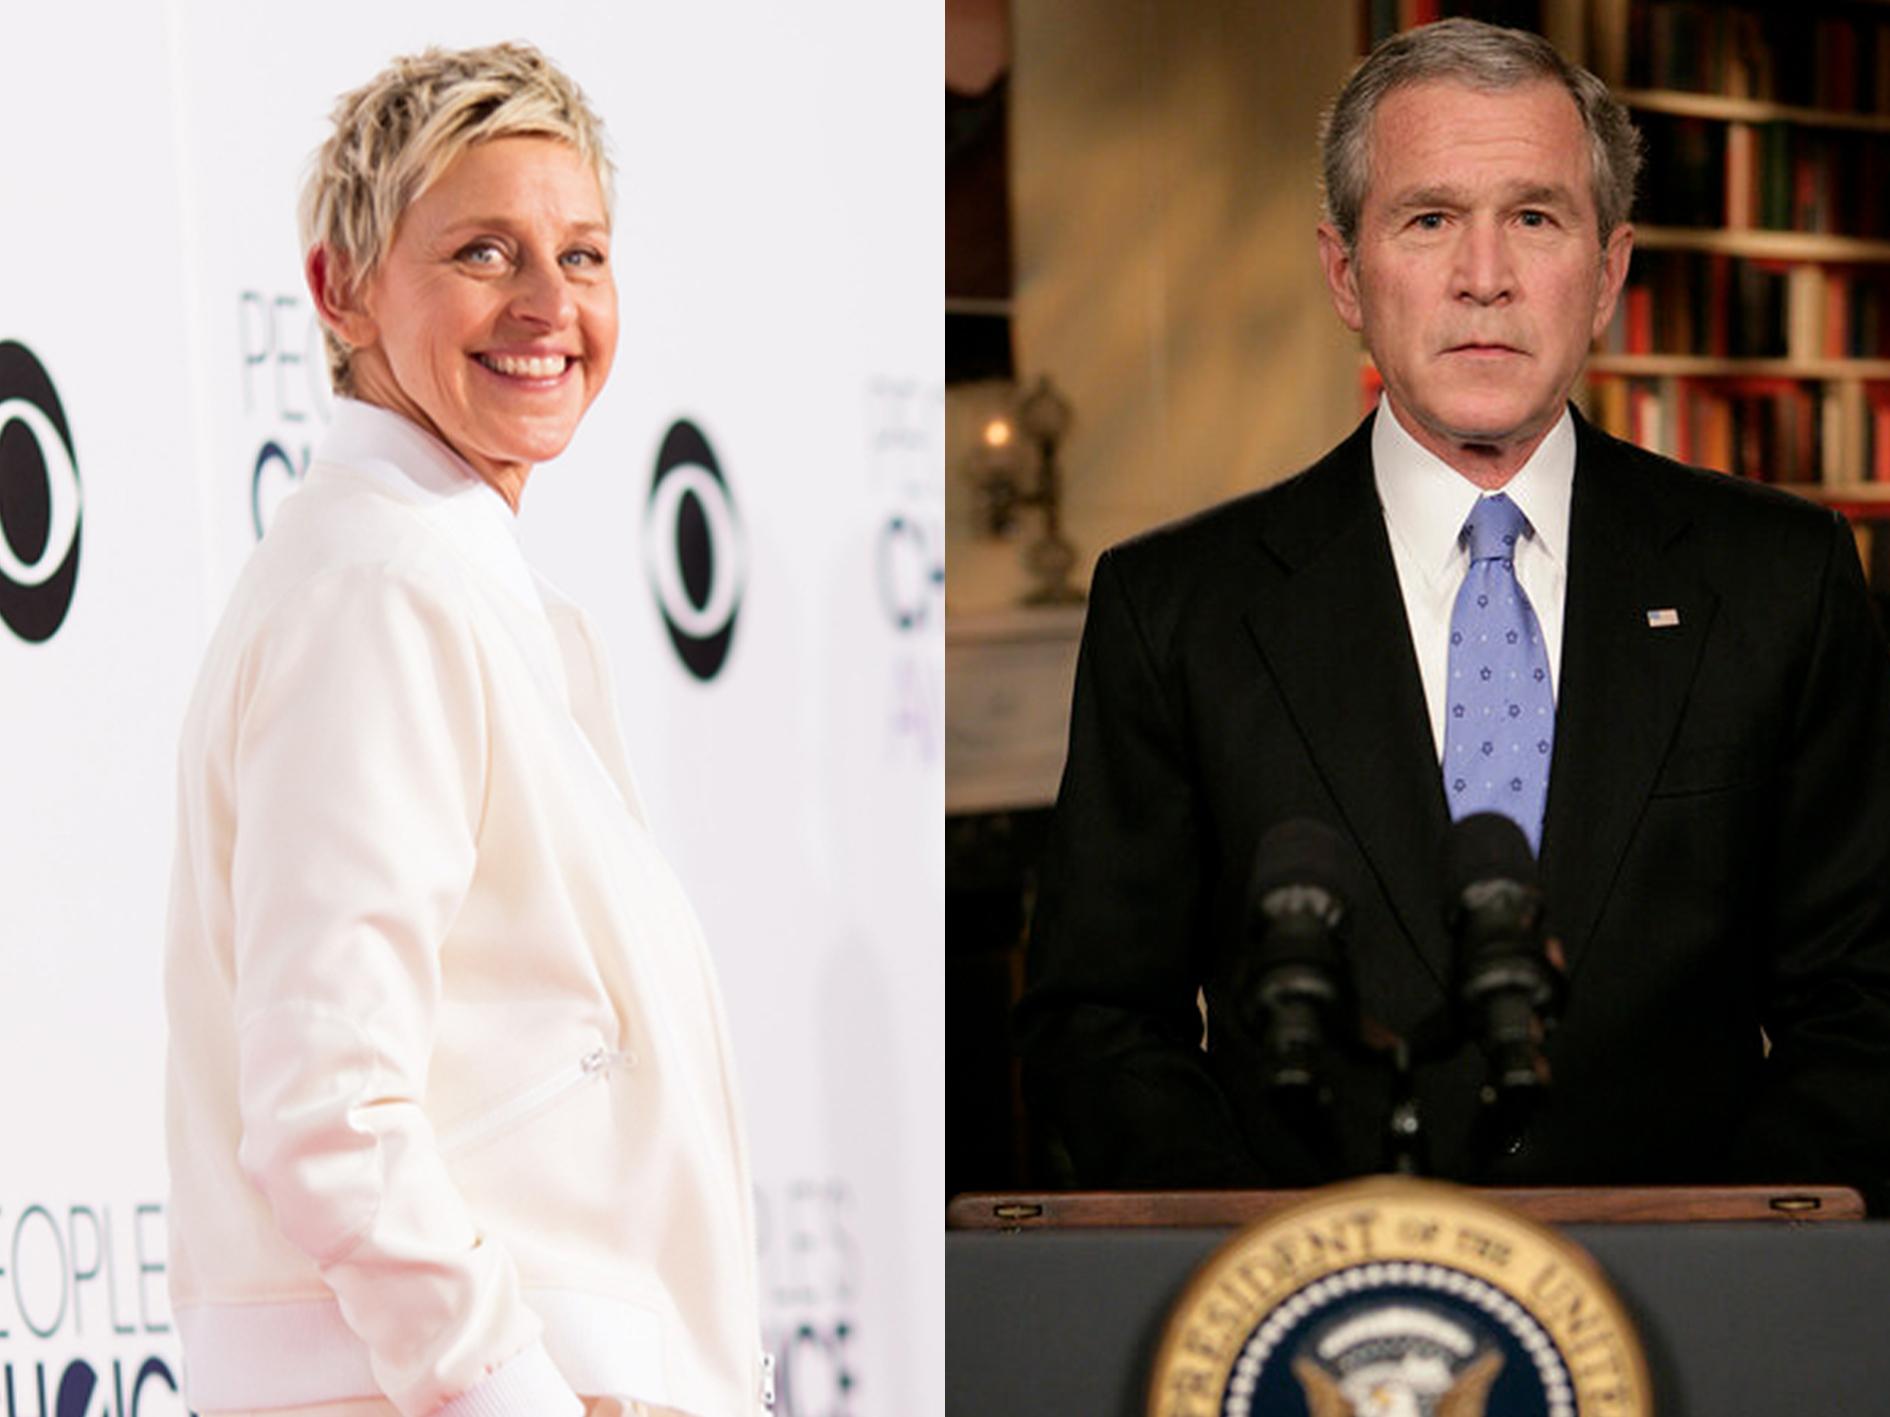 Ellen DeGeneres George W Bush 25 Things You Didn't Know About Ellen DeGeneres